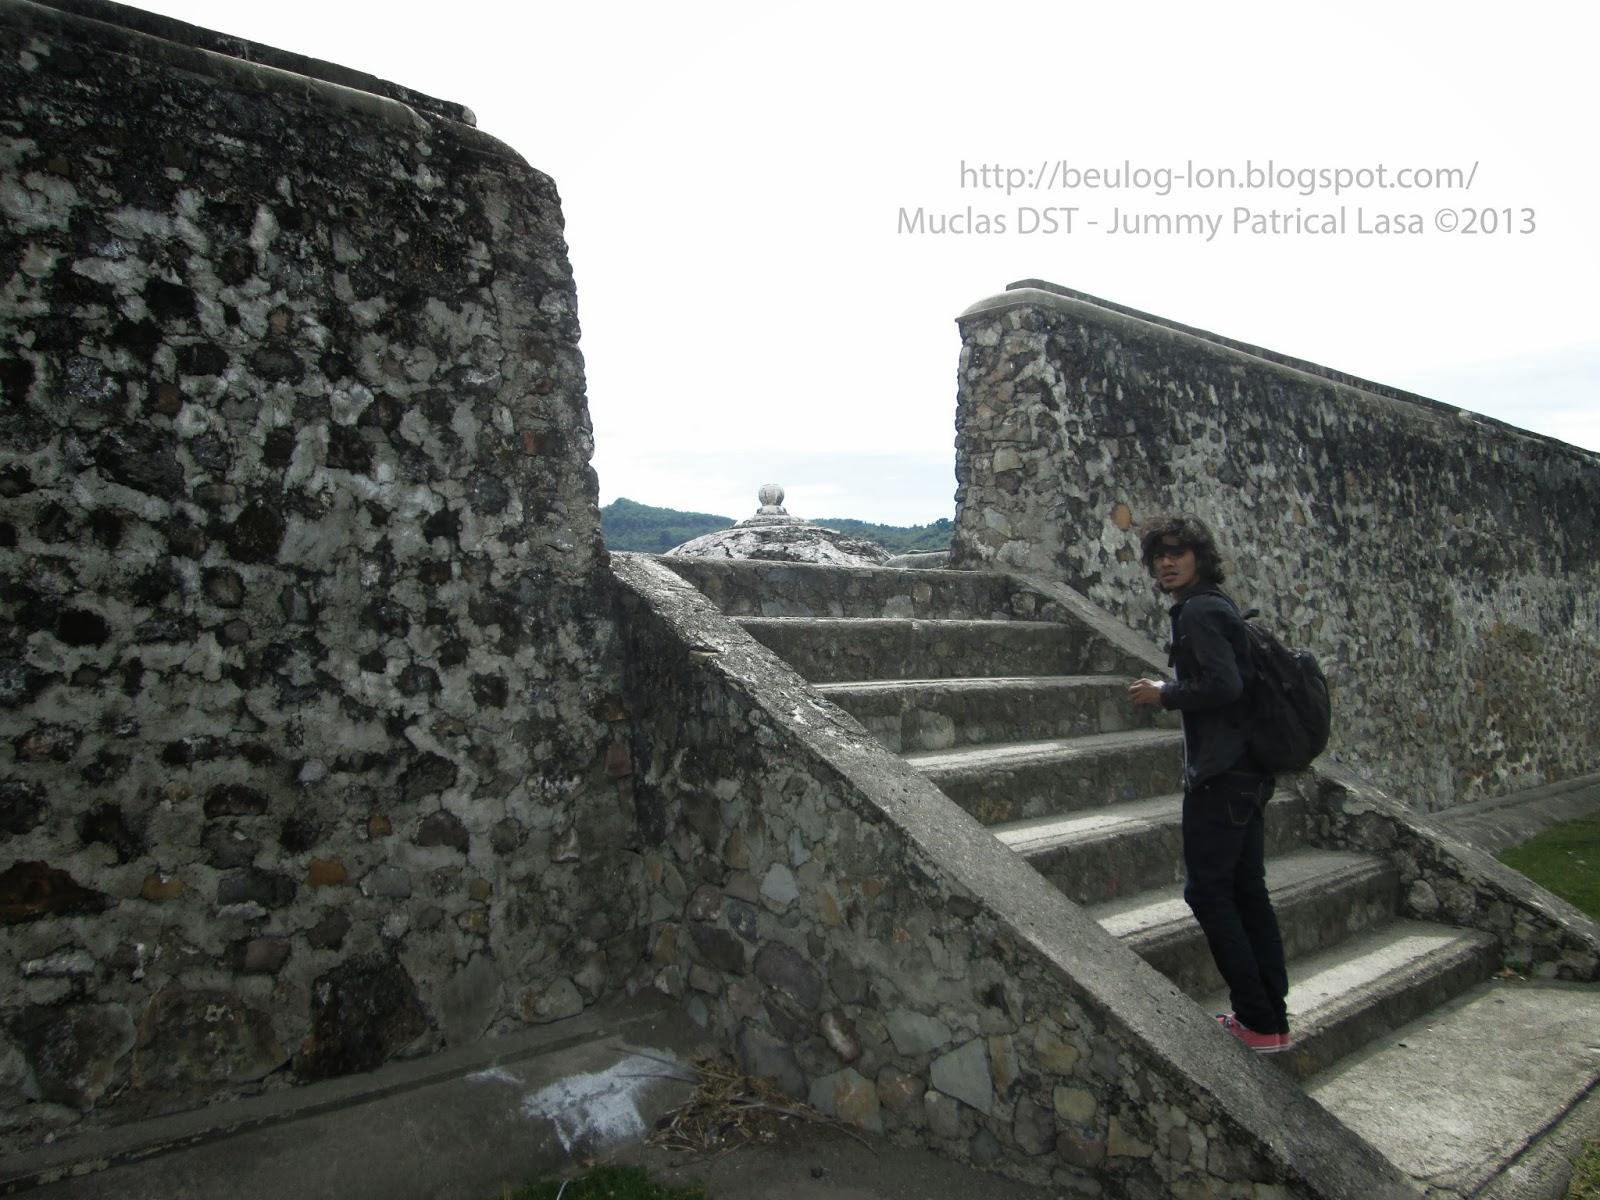 Benteng Indra Patra Bukti Historis Perlahan Terkikis Sebagai Pertahanan Kerajaan